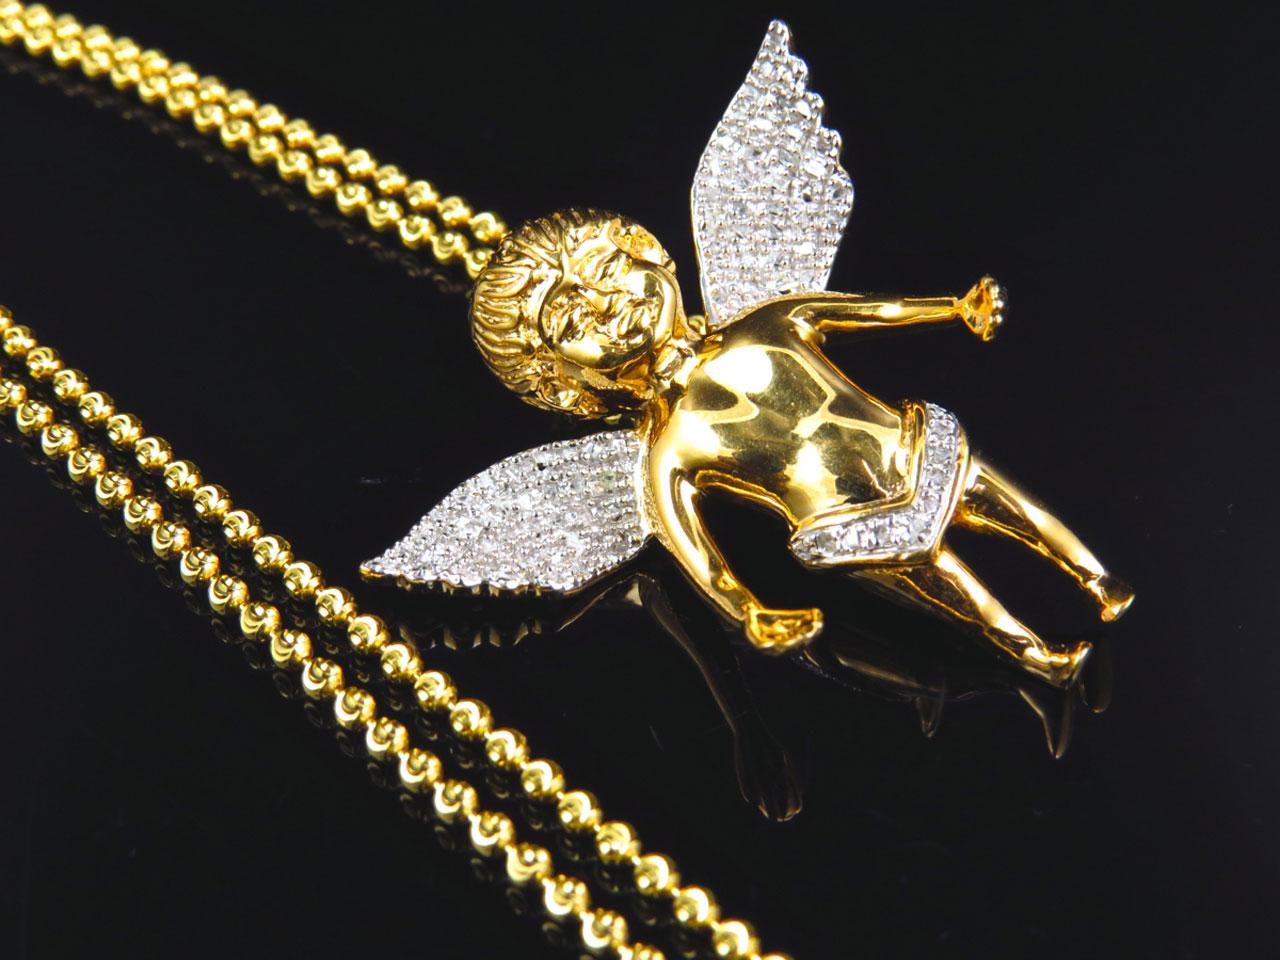 Genuine diamond chubby angel pendant charm chain 075 ct in yellow genuine diamond chubby angel pendant charm chain 075 ct in yellow gold finish ebay aloadofball Gallery